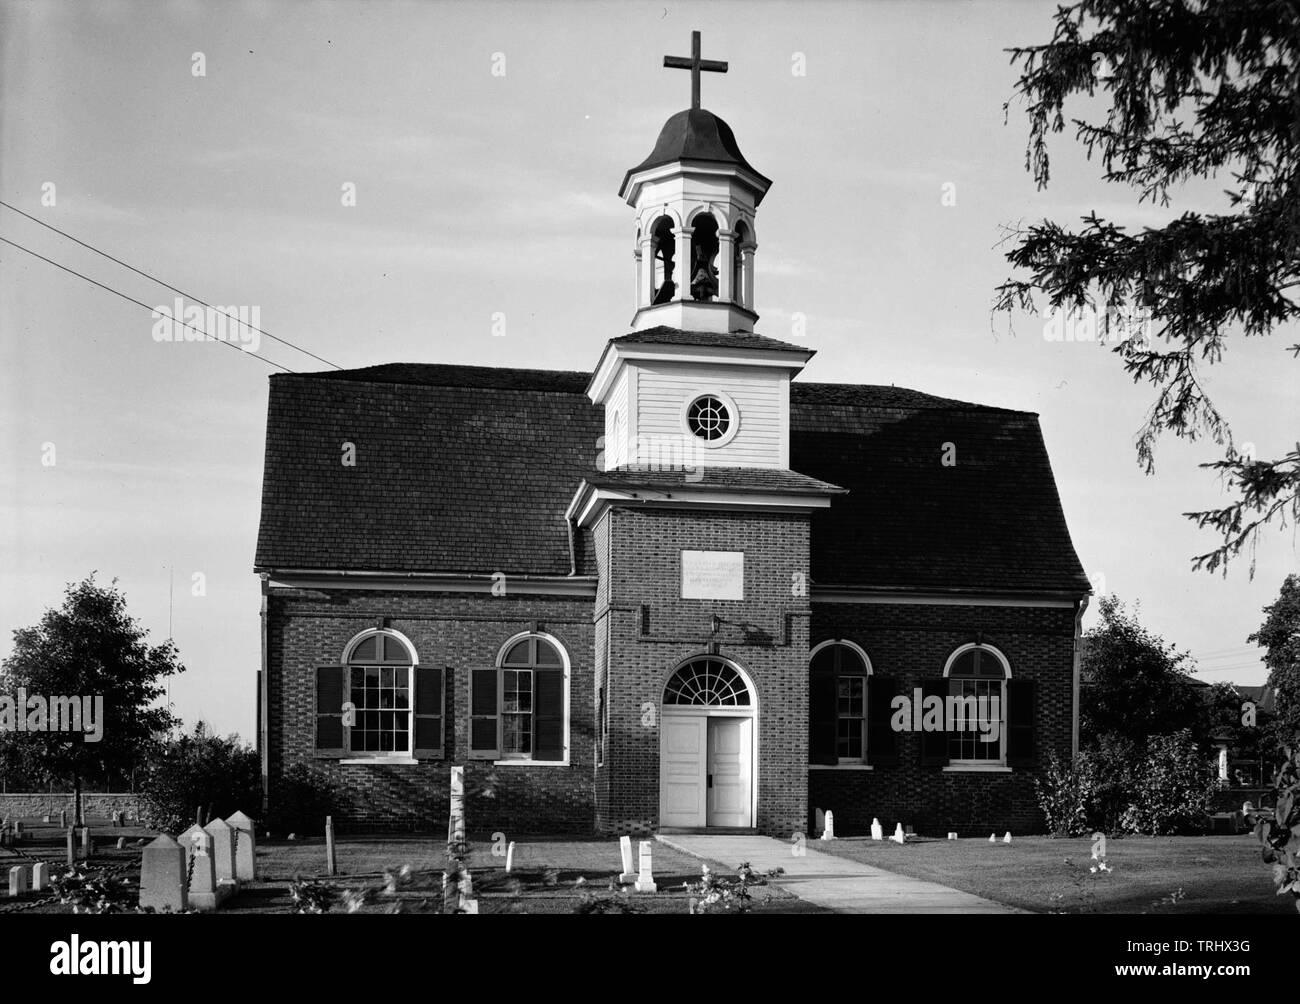 1920s MINNEAPOLIS MN DOWNTOWN AT CHRISTMAS PHOTO-BELL CHURCH-VINTAGE MAIN STREET